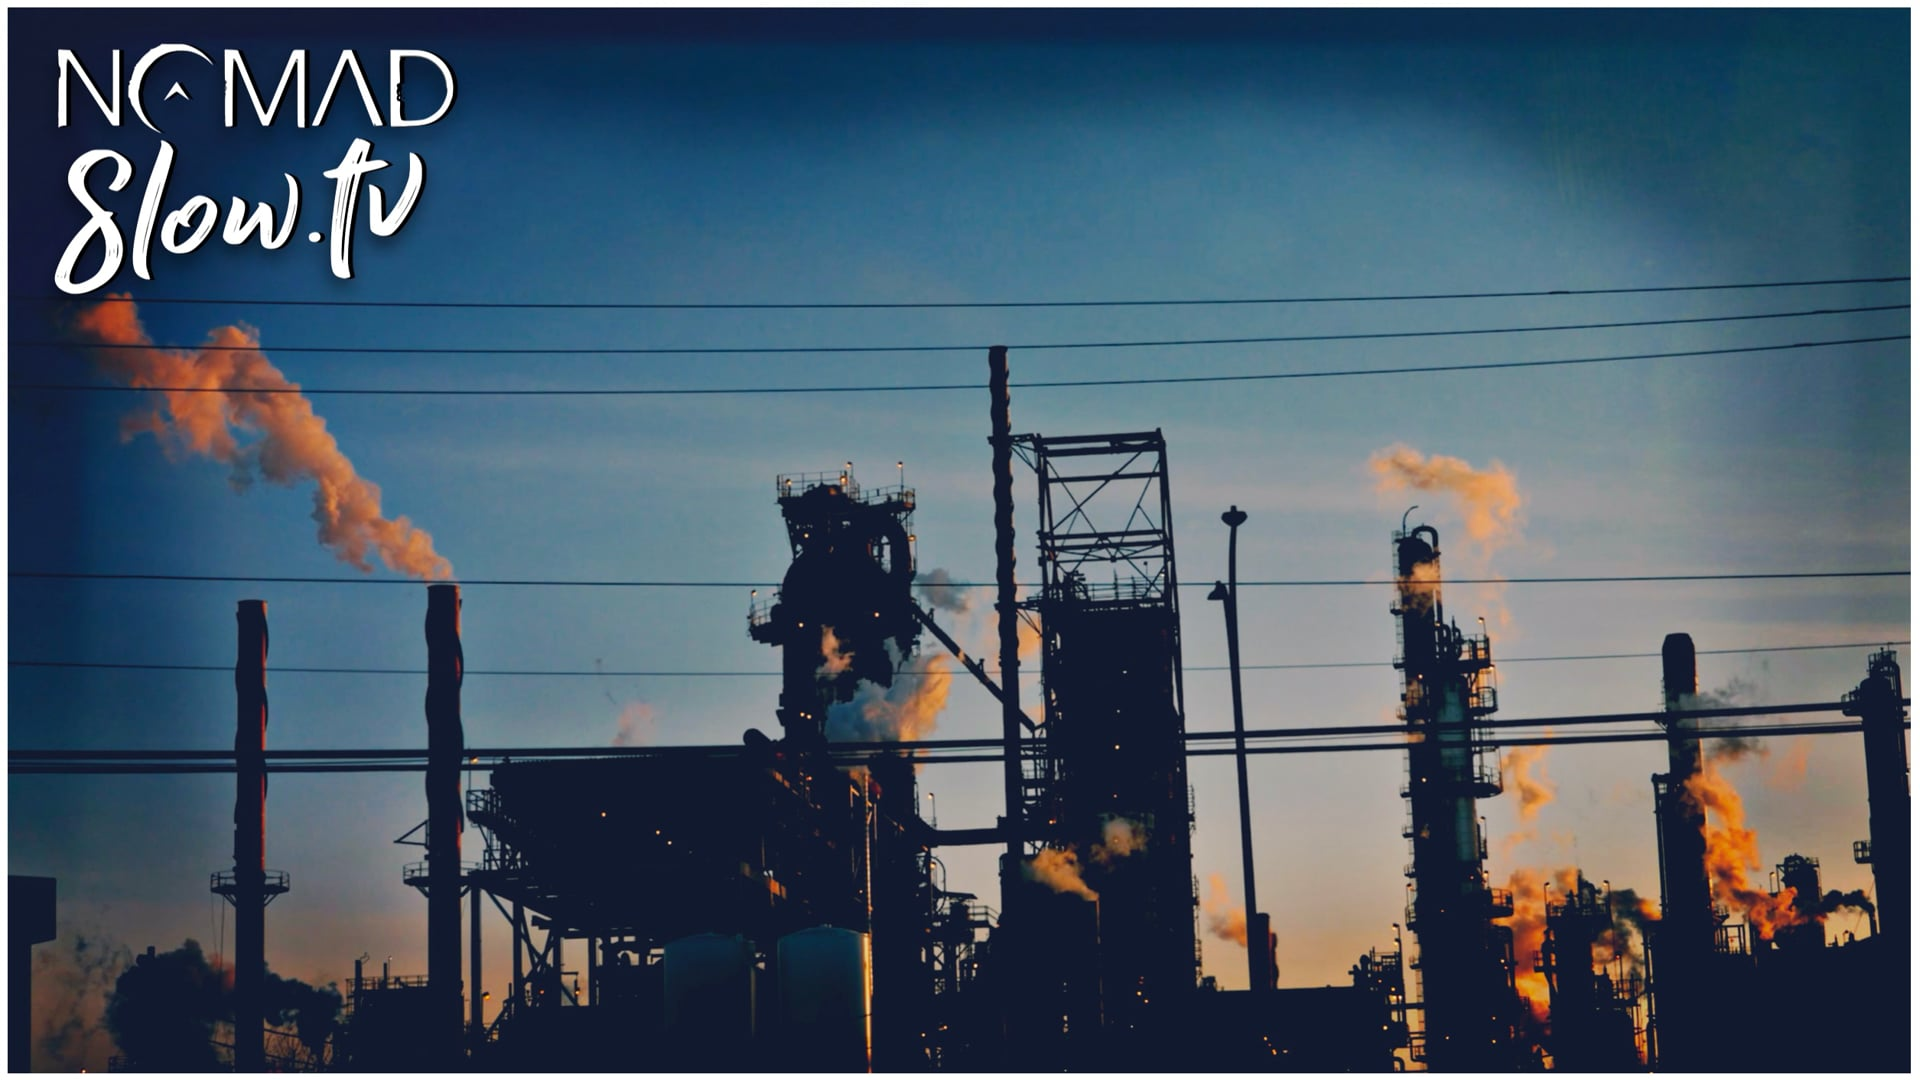 Winter Refinery | Spirit of Fire - Jesse Gallagher